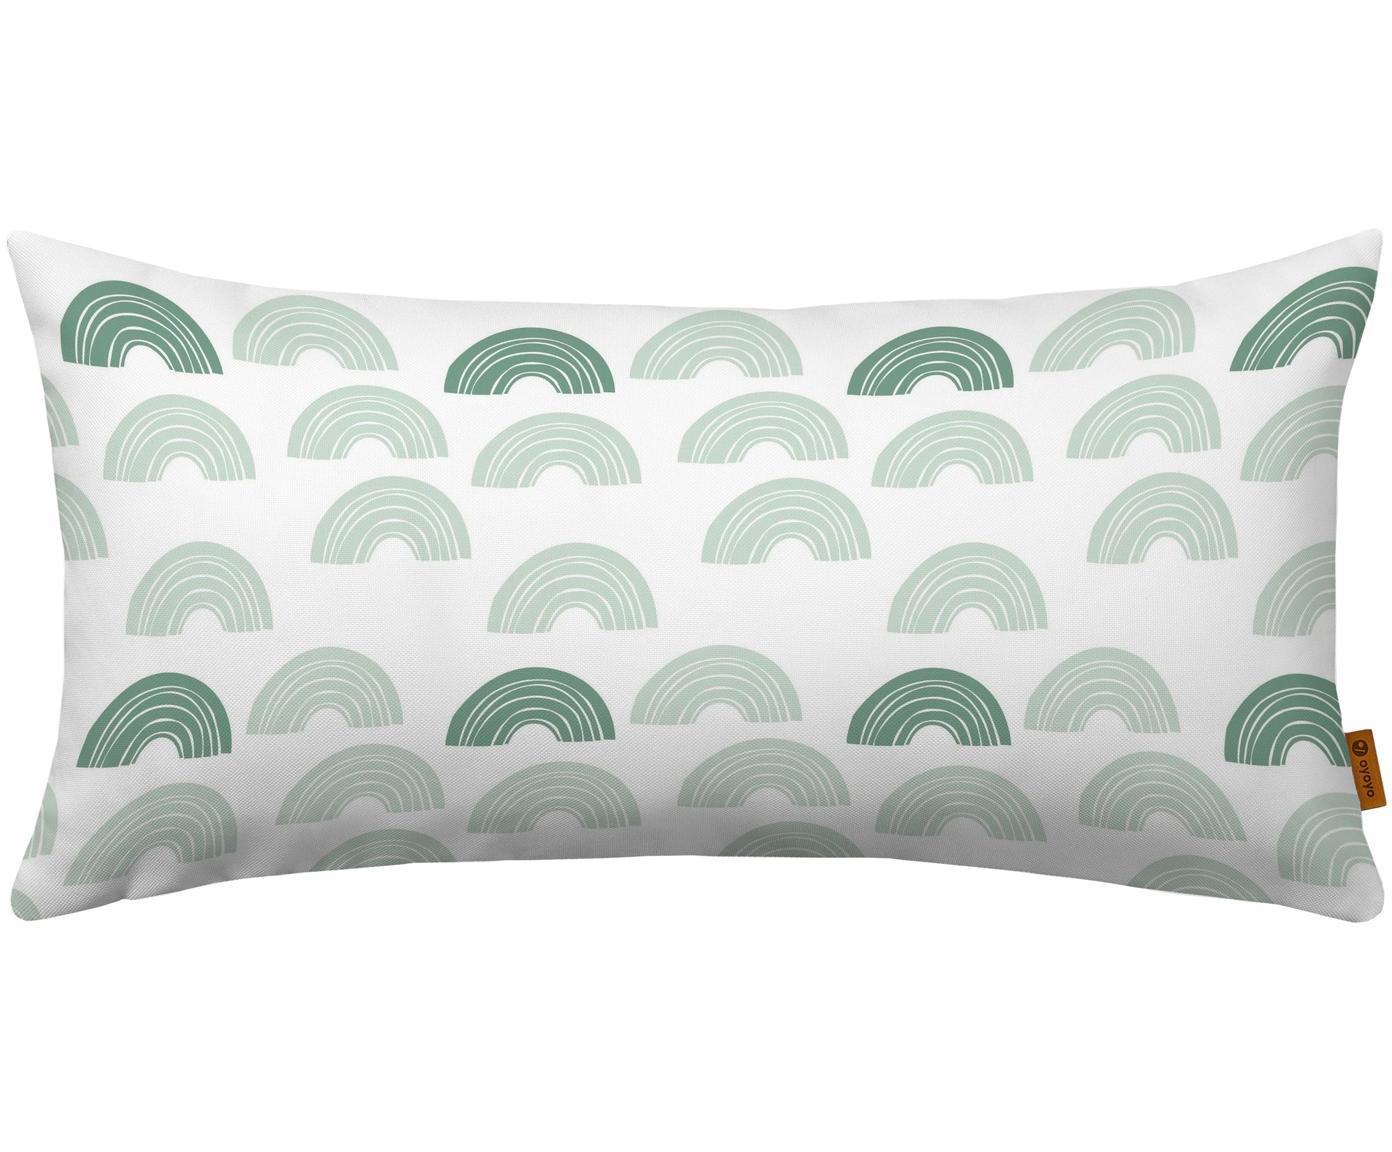 Cuscino imbottito con arcobaleni Rainbow Dreams, Rivestimento: cotone, Bianco, verde menta, verde, Larg. 30 x Lung. 60 cm